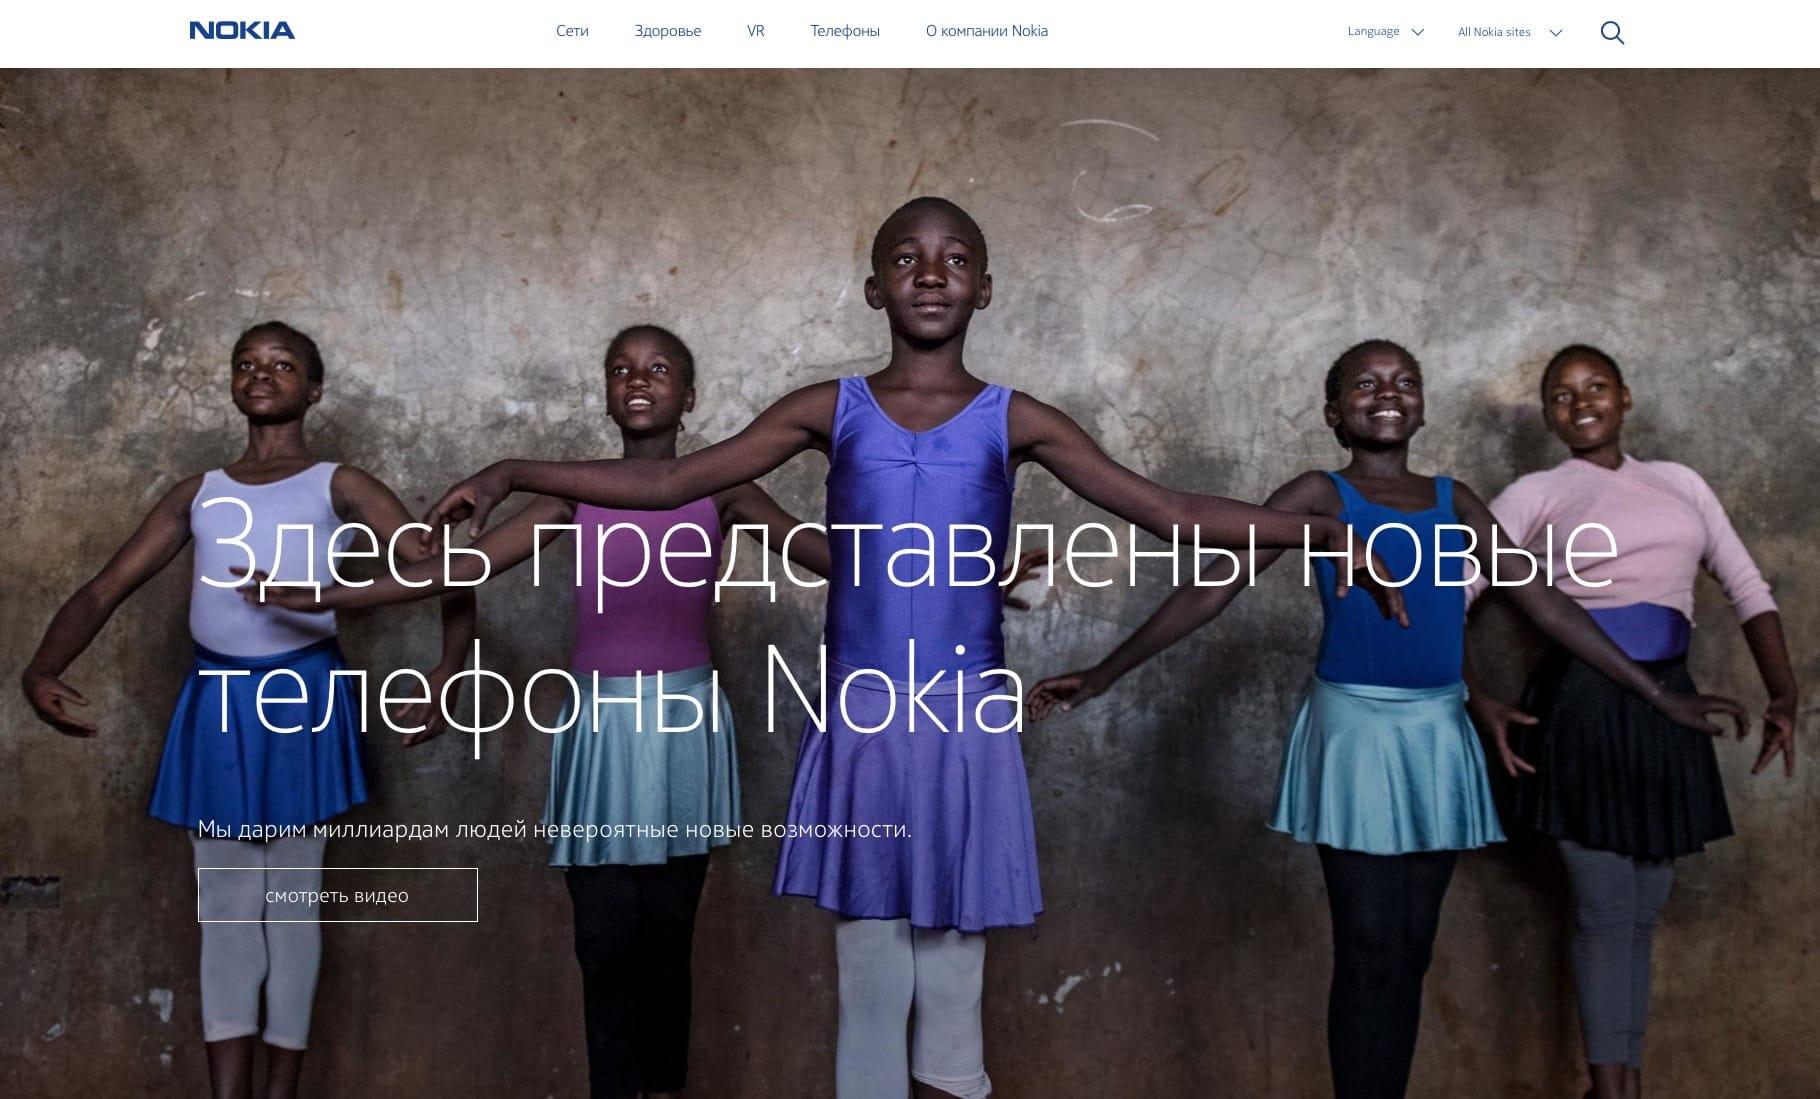 Nokia Russia Smartphone